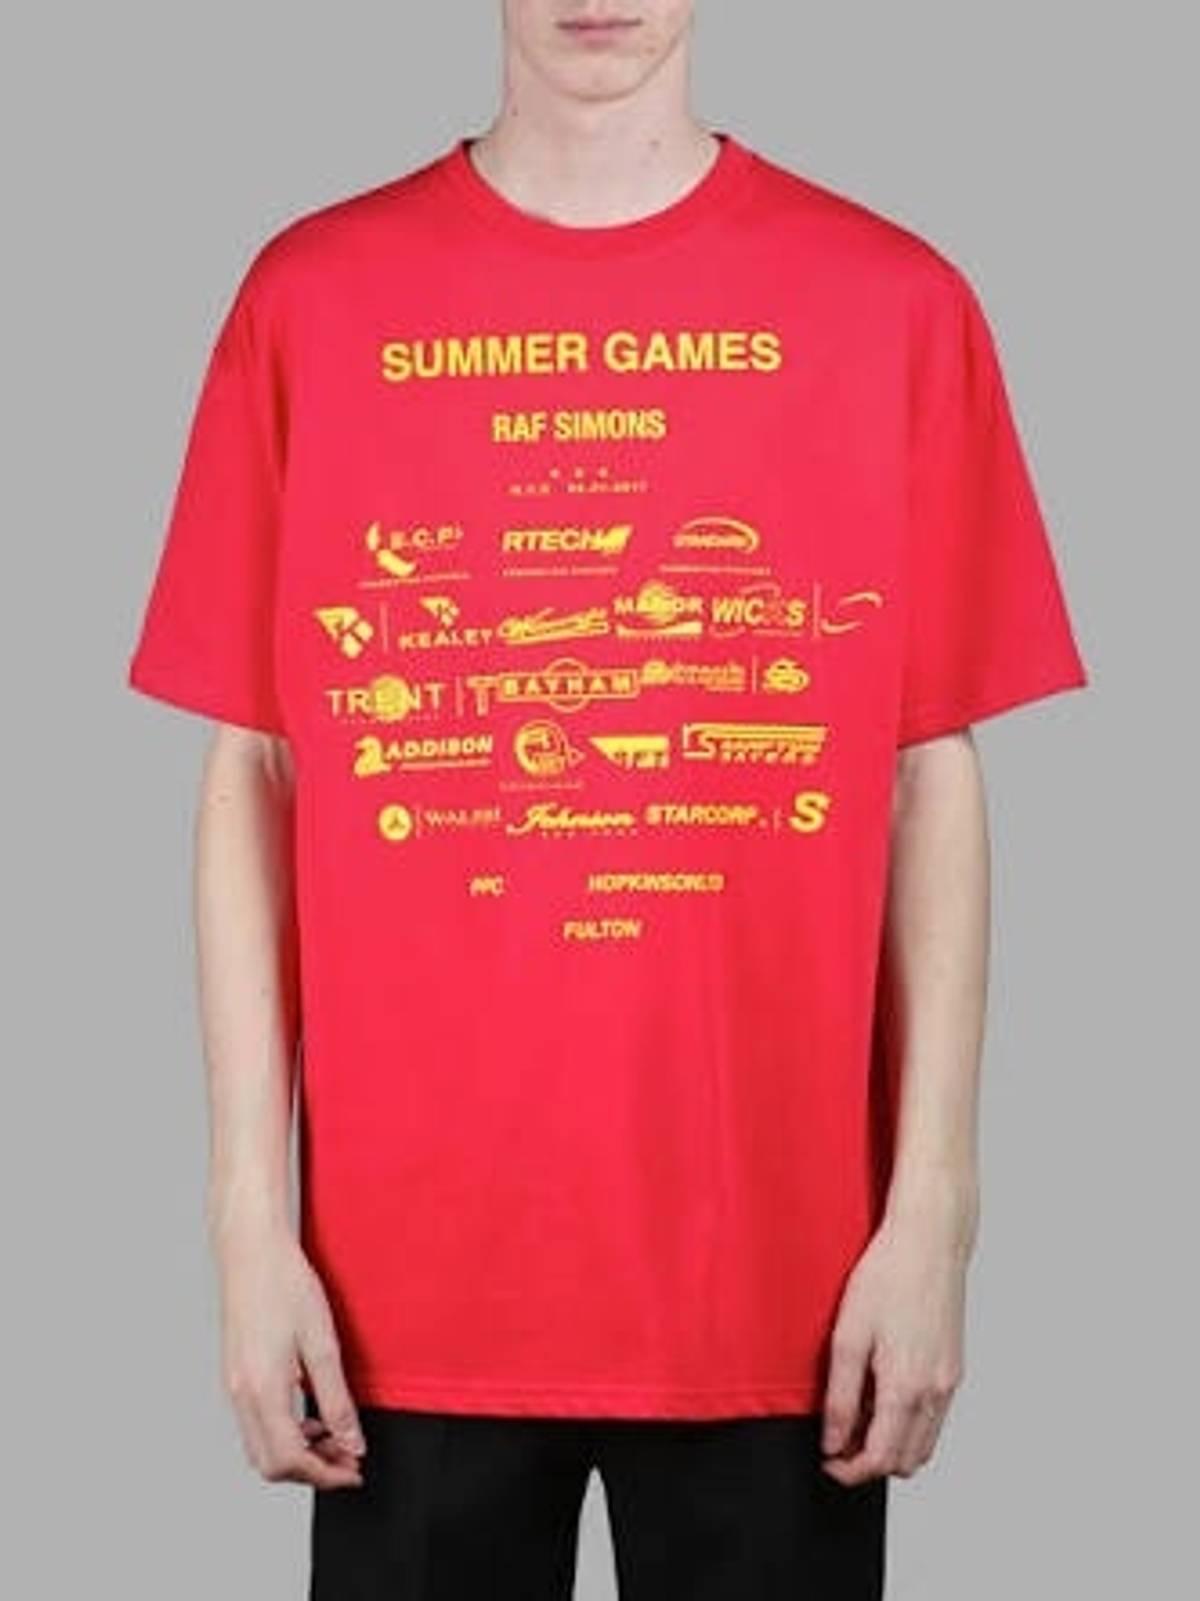 7e0f56fbf382 Raf Simons  summer Games  Tee